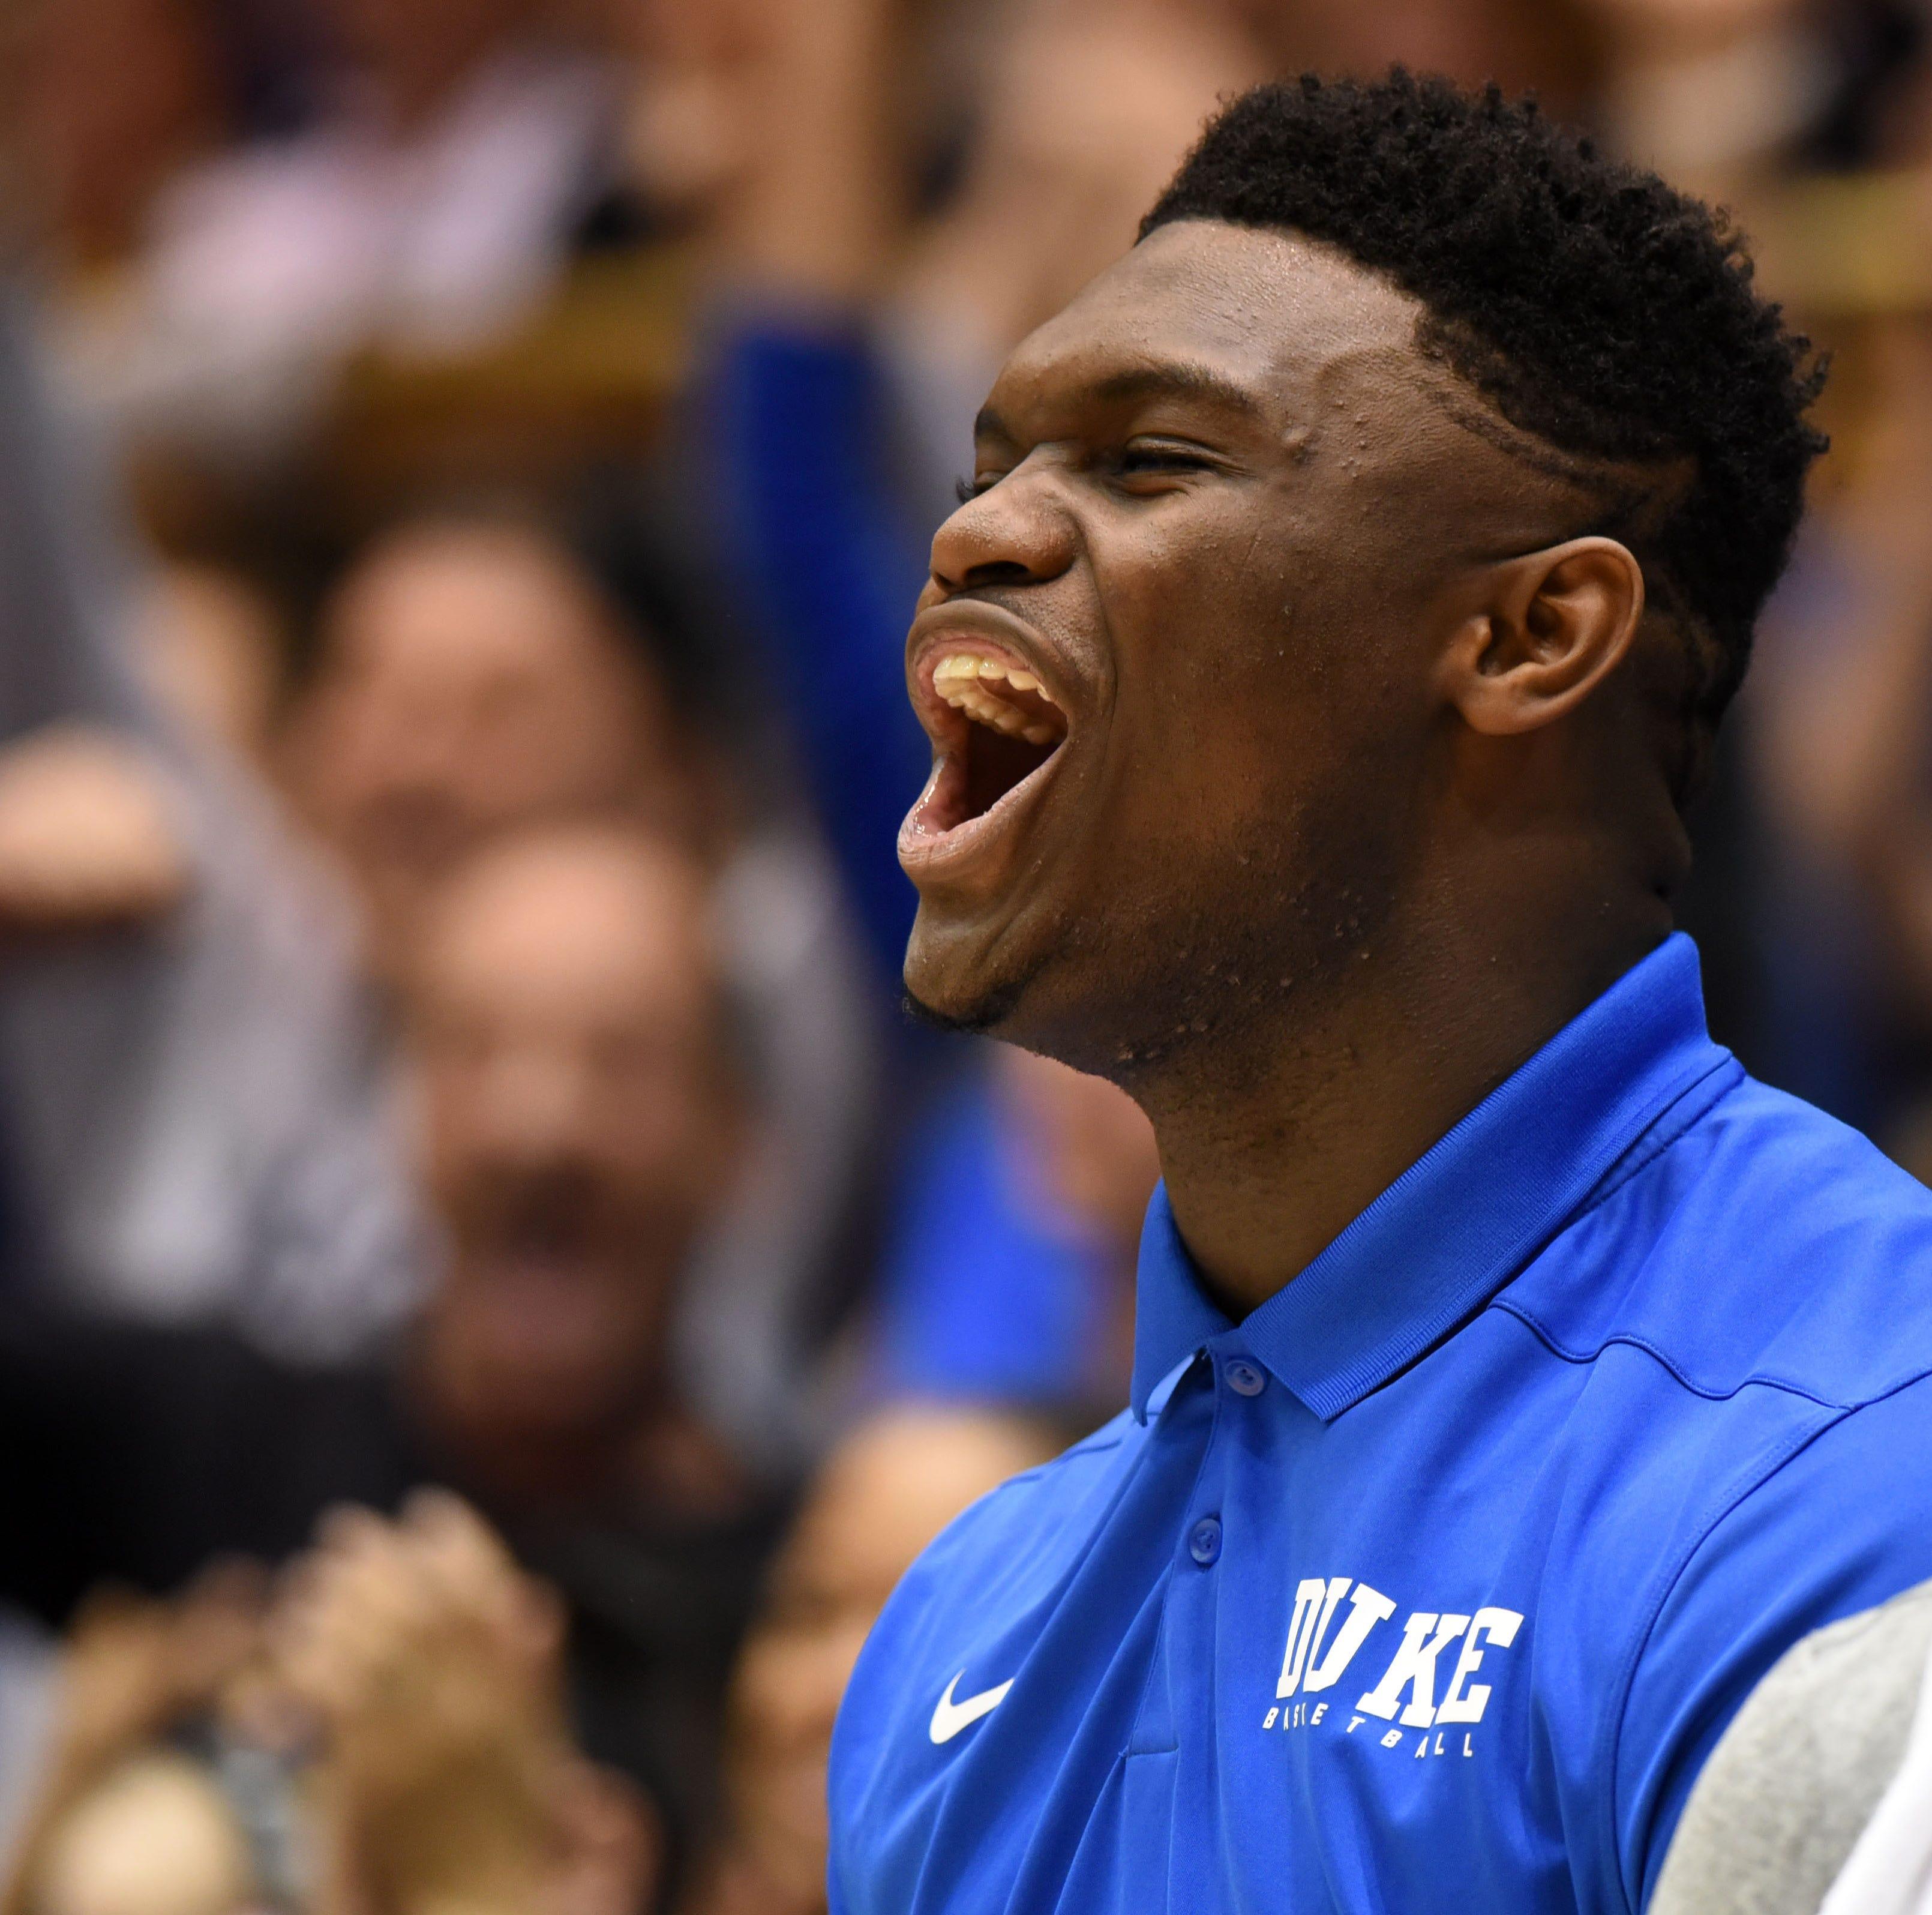 NBA mock draft: Zion Williamson to Phoenix Suns? NBA projections still high on Duke star